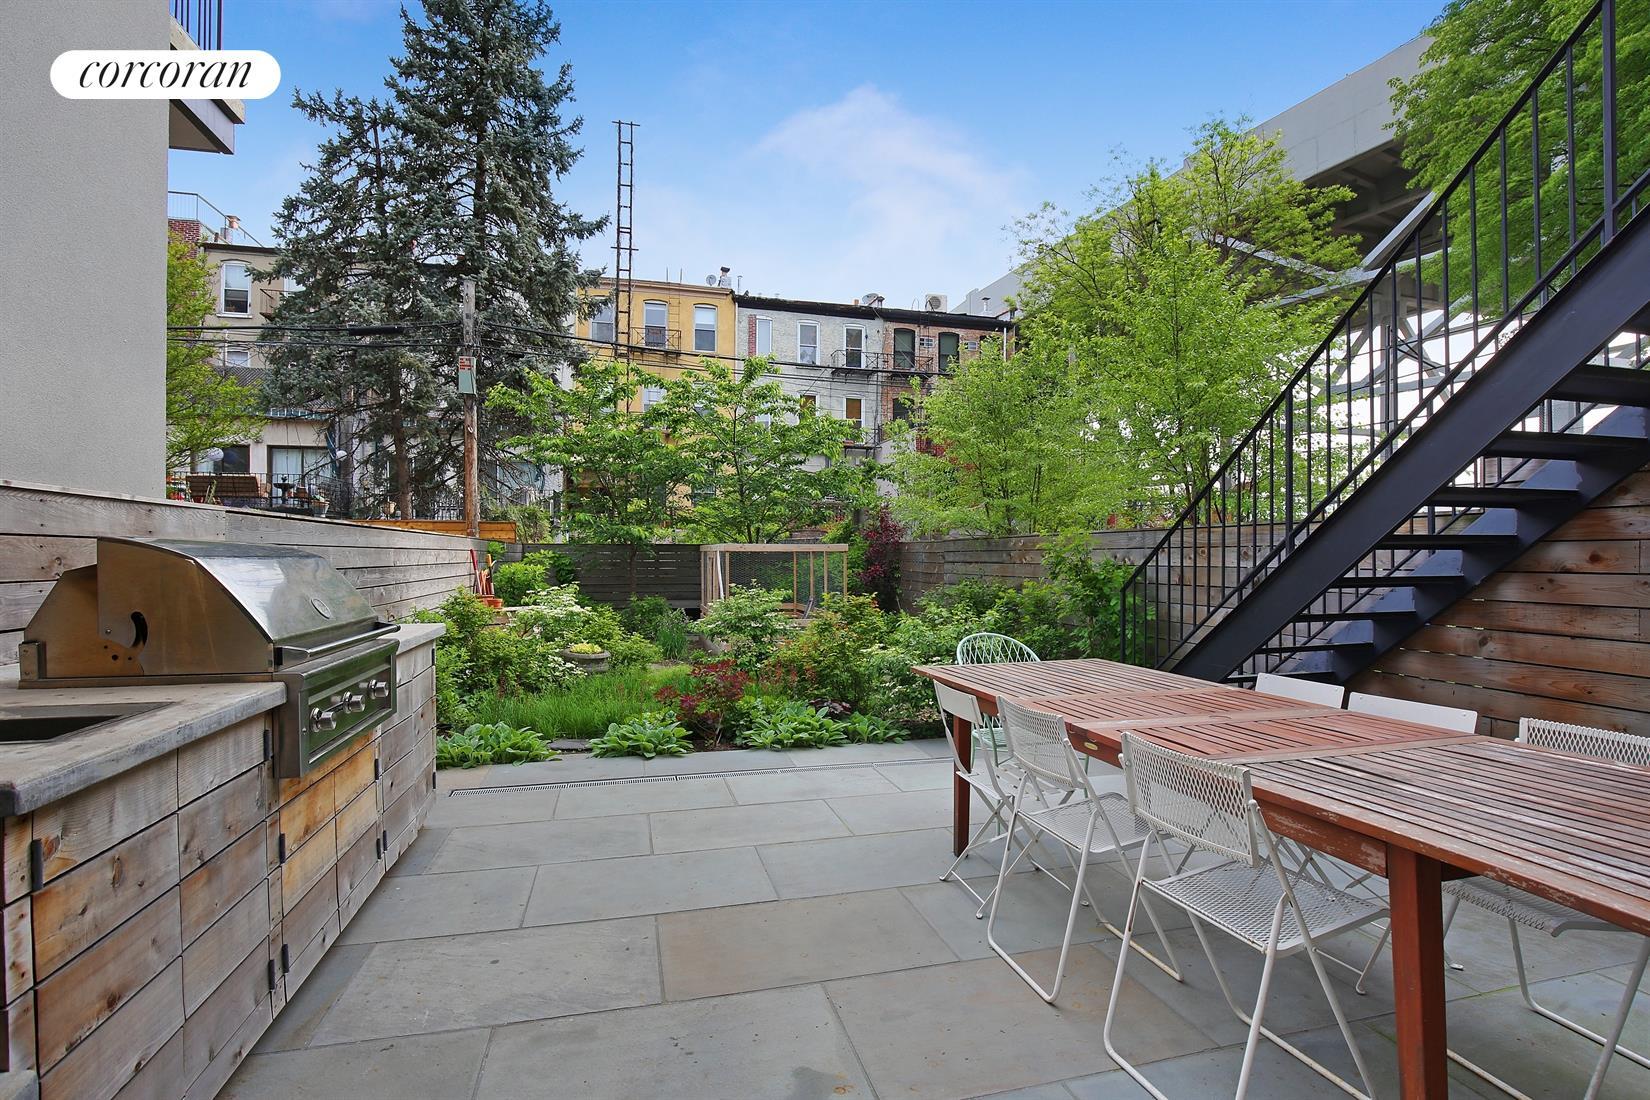 Corcoran, 203 Huntington Street, Carroll Gardens Real Estate ...